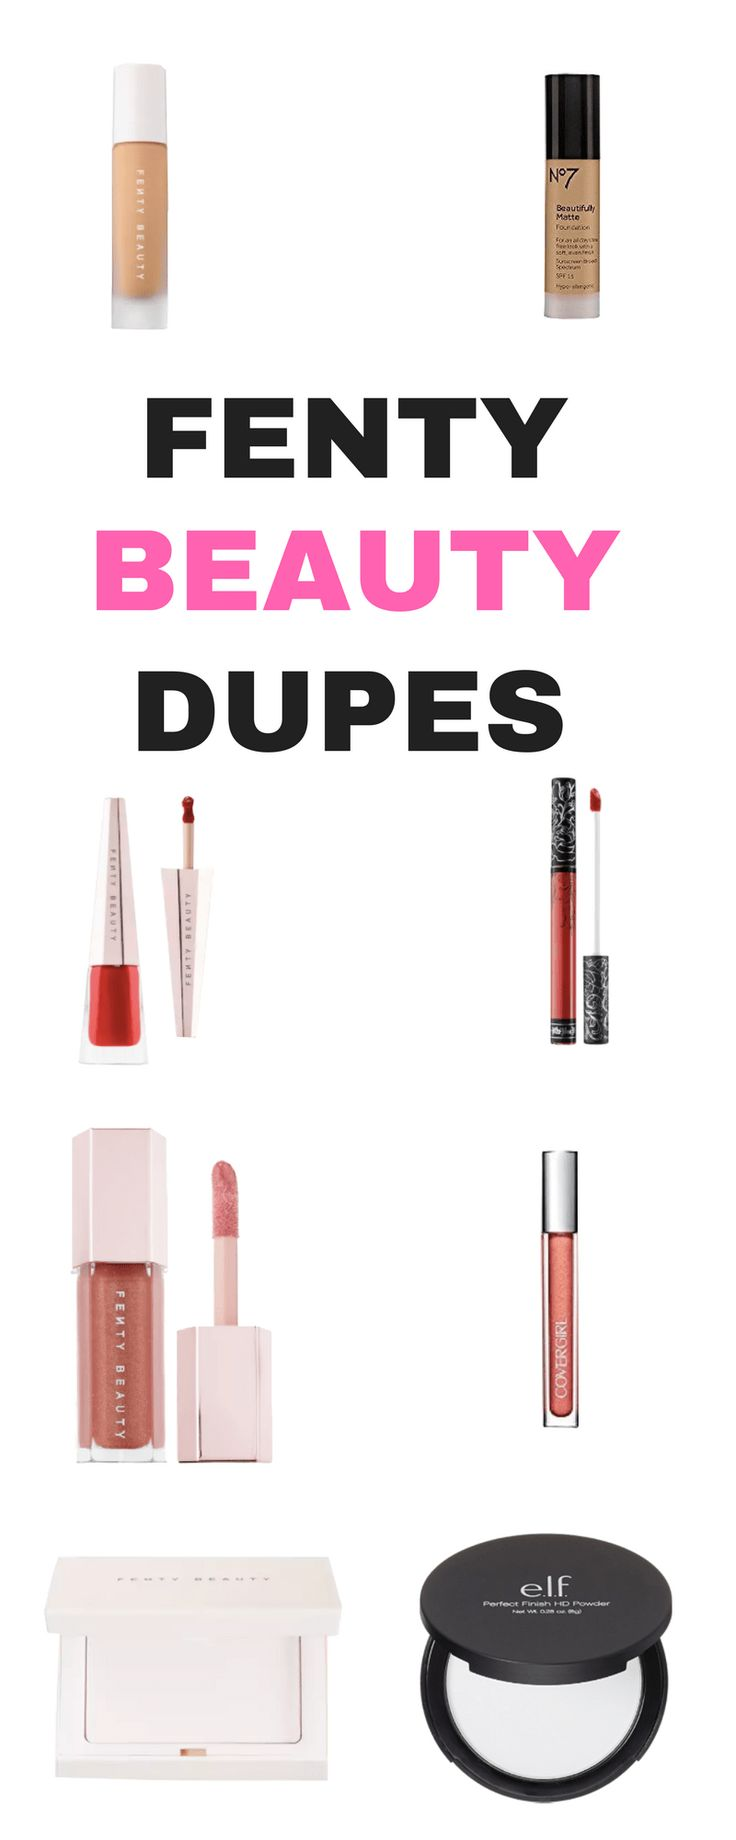 4 Fenty Beauty Dupes | MakeupVanityIdeas.com